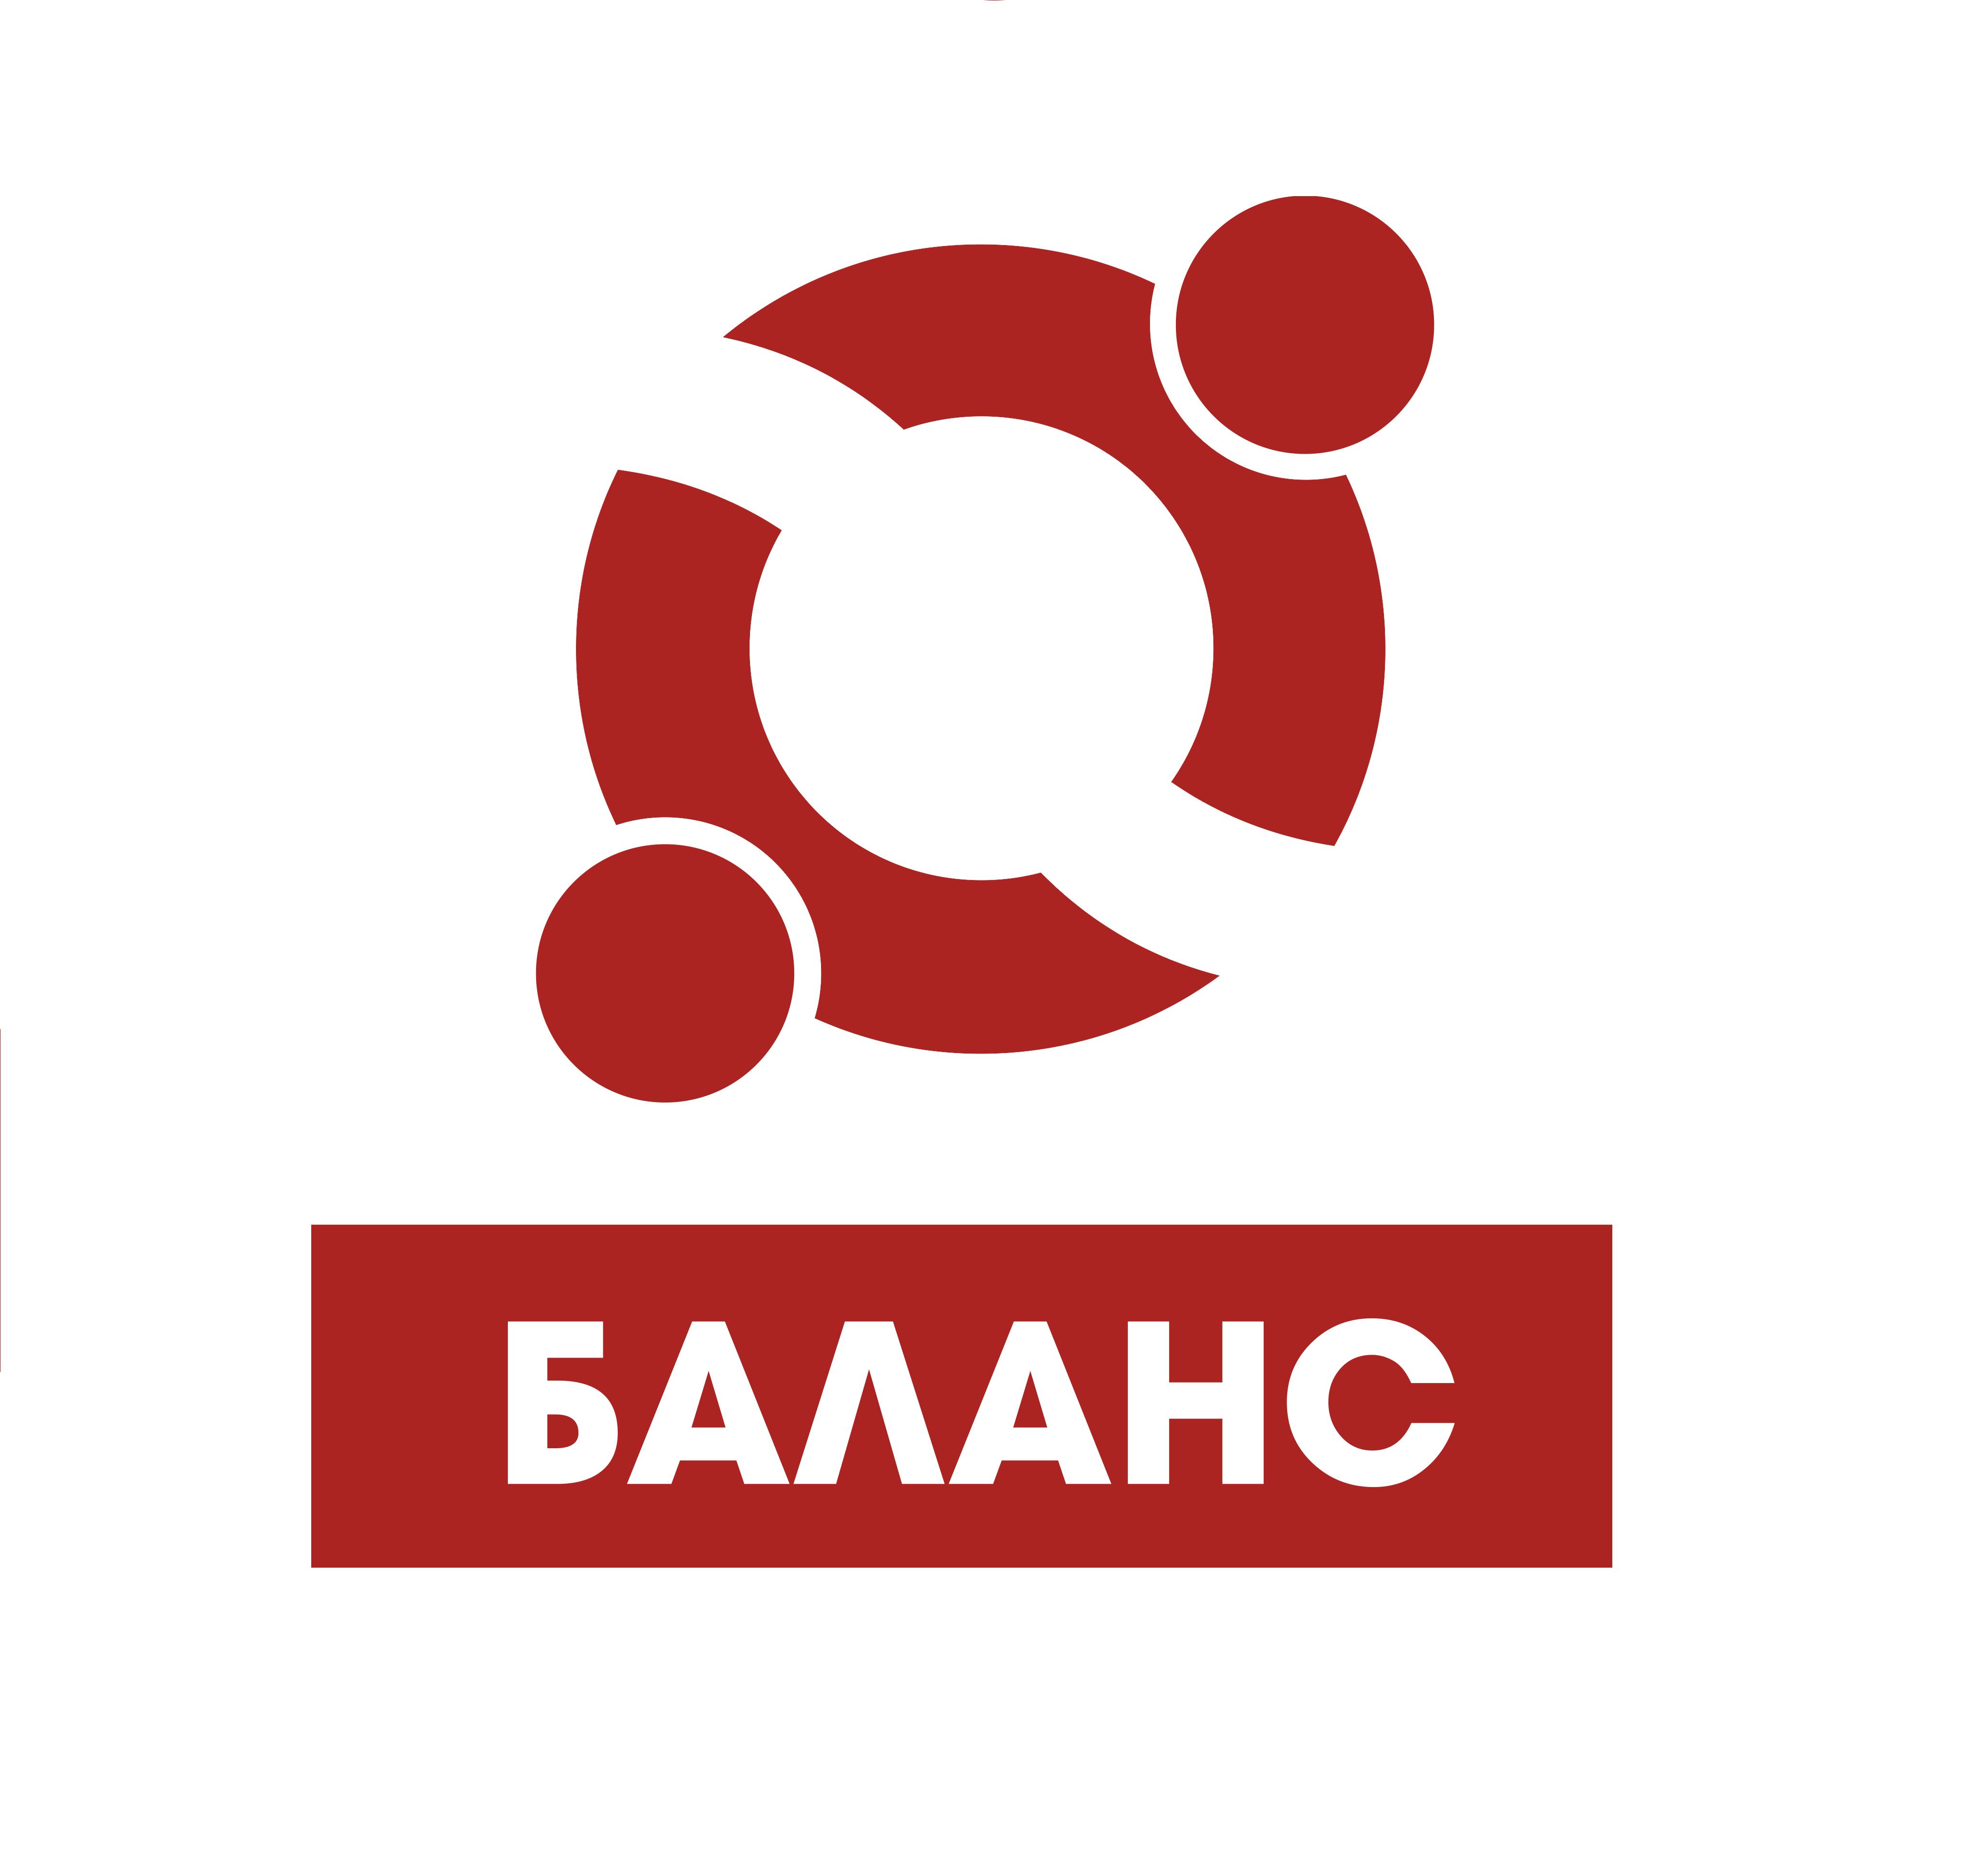 Логотип бухгалтерских услуг картинки что такое it аутсорсинг